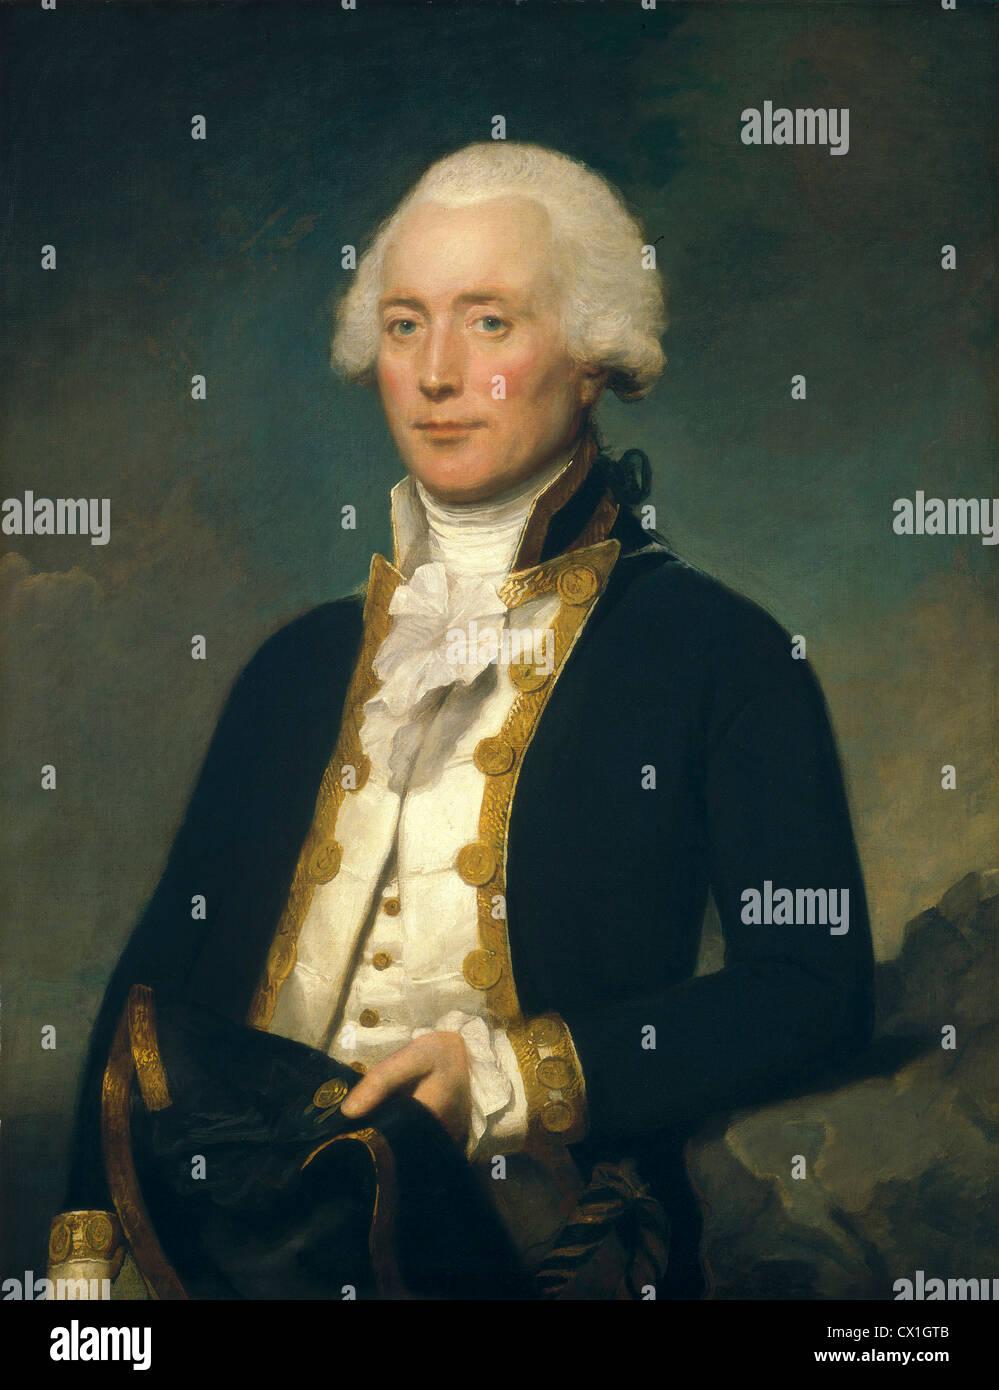 Lemuel Francis Abbott, Captain Robert Calder, British, c. 1755/1761 - 1802, c. 1787/1790, oil on canvas - Stock Image